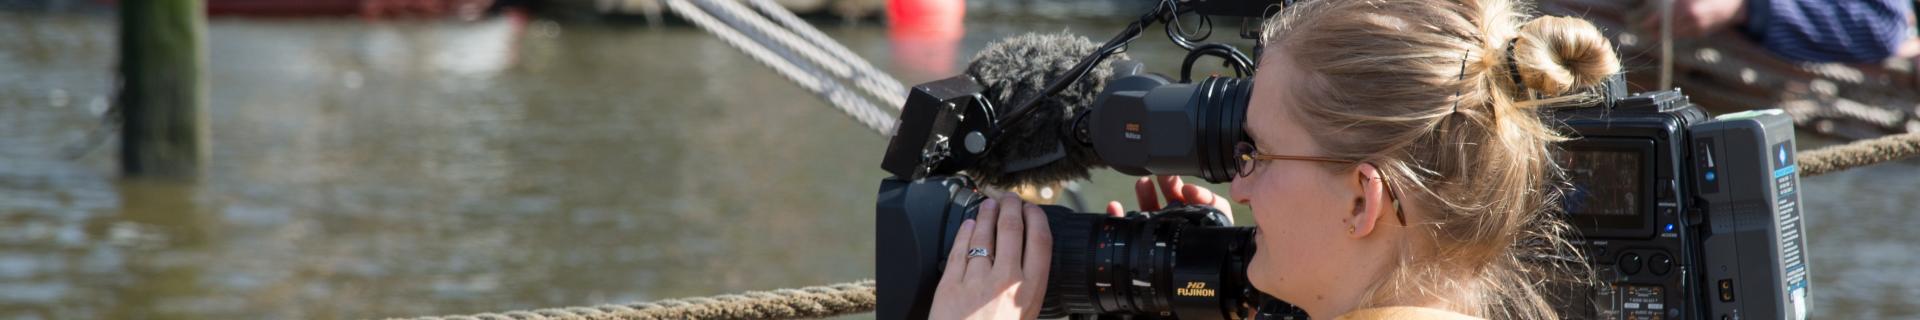 A female reporter operates a television camera